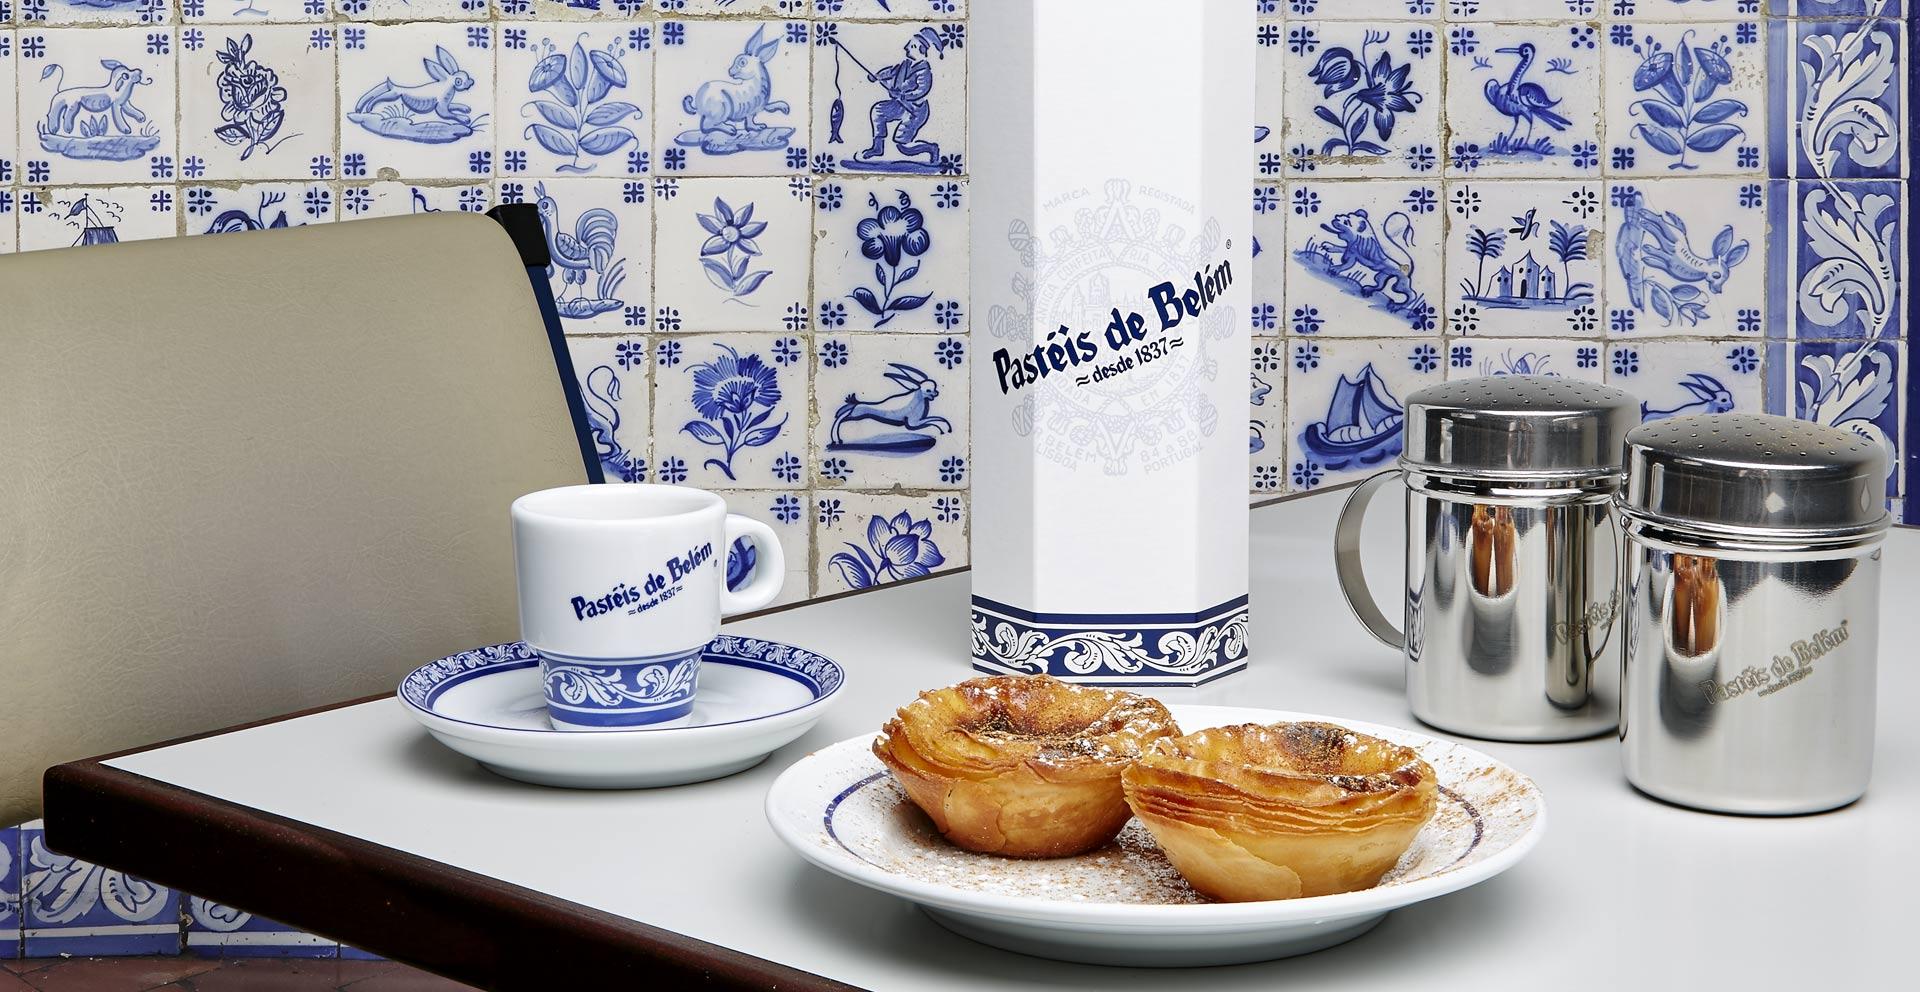 pasteis-portugal-lisbonne-adresse